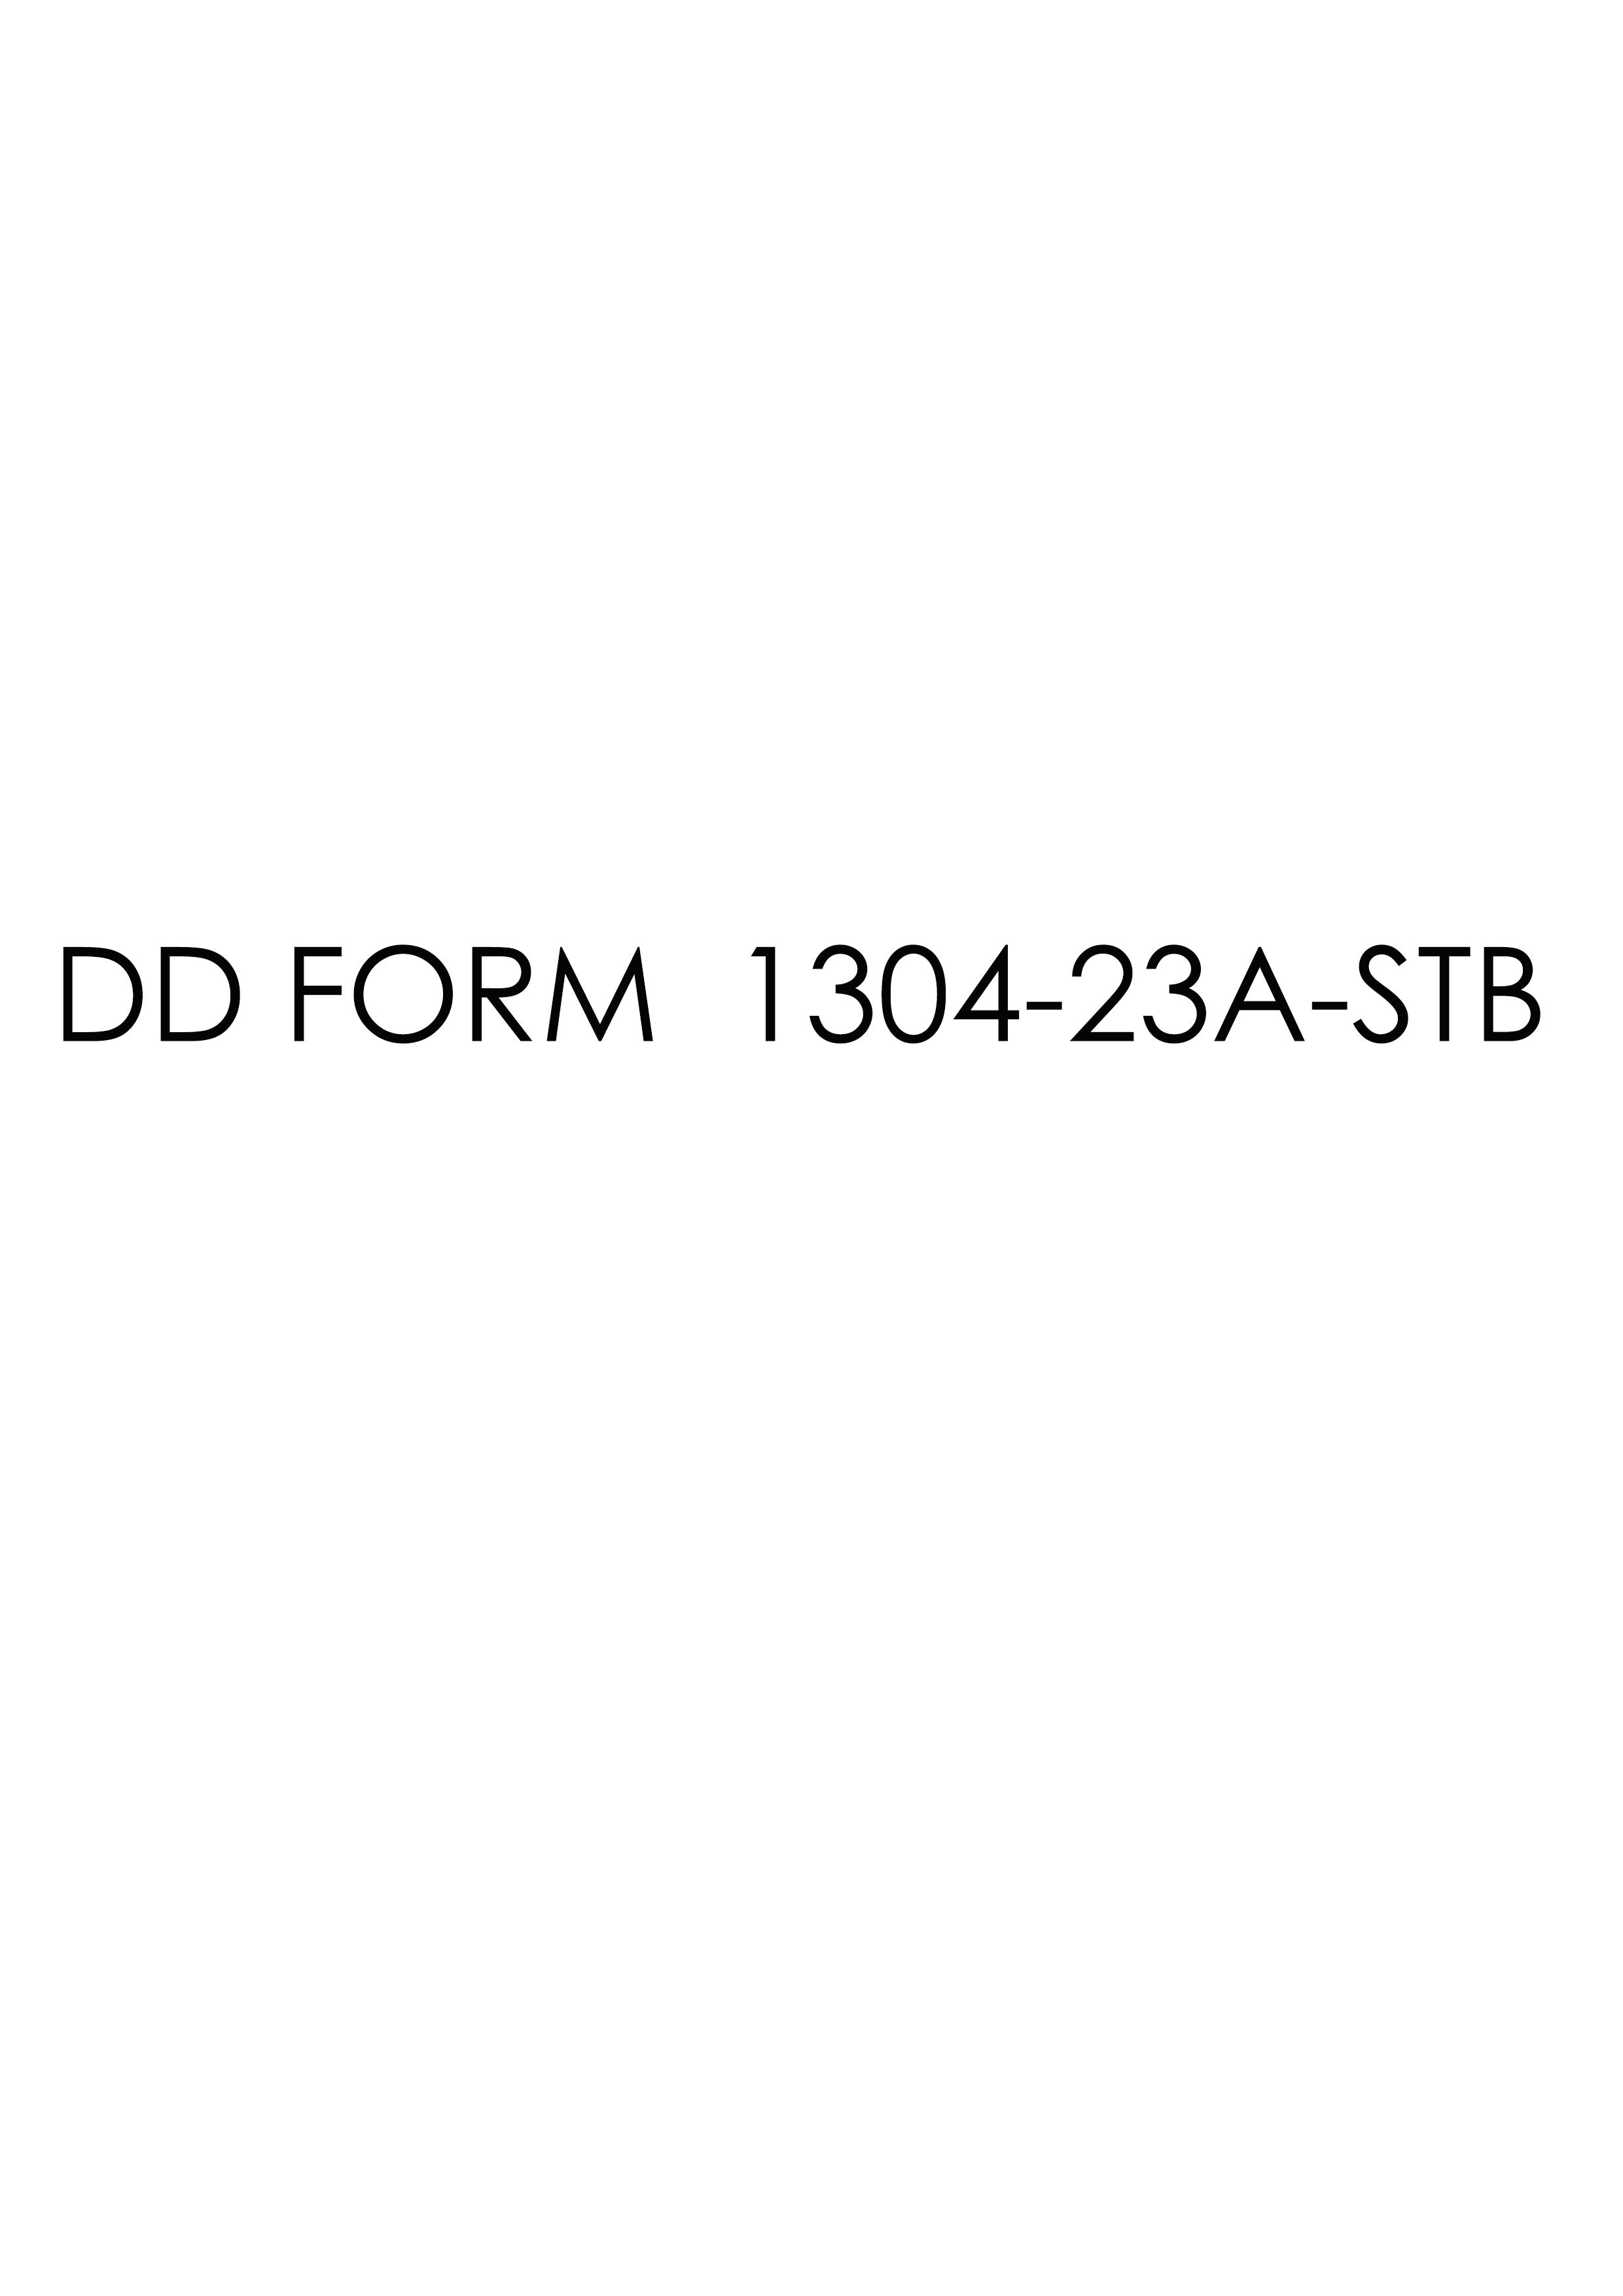 Download dd Form 1304-23A-STB Free